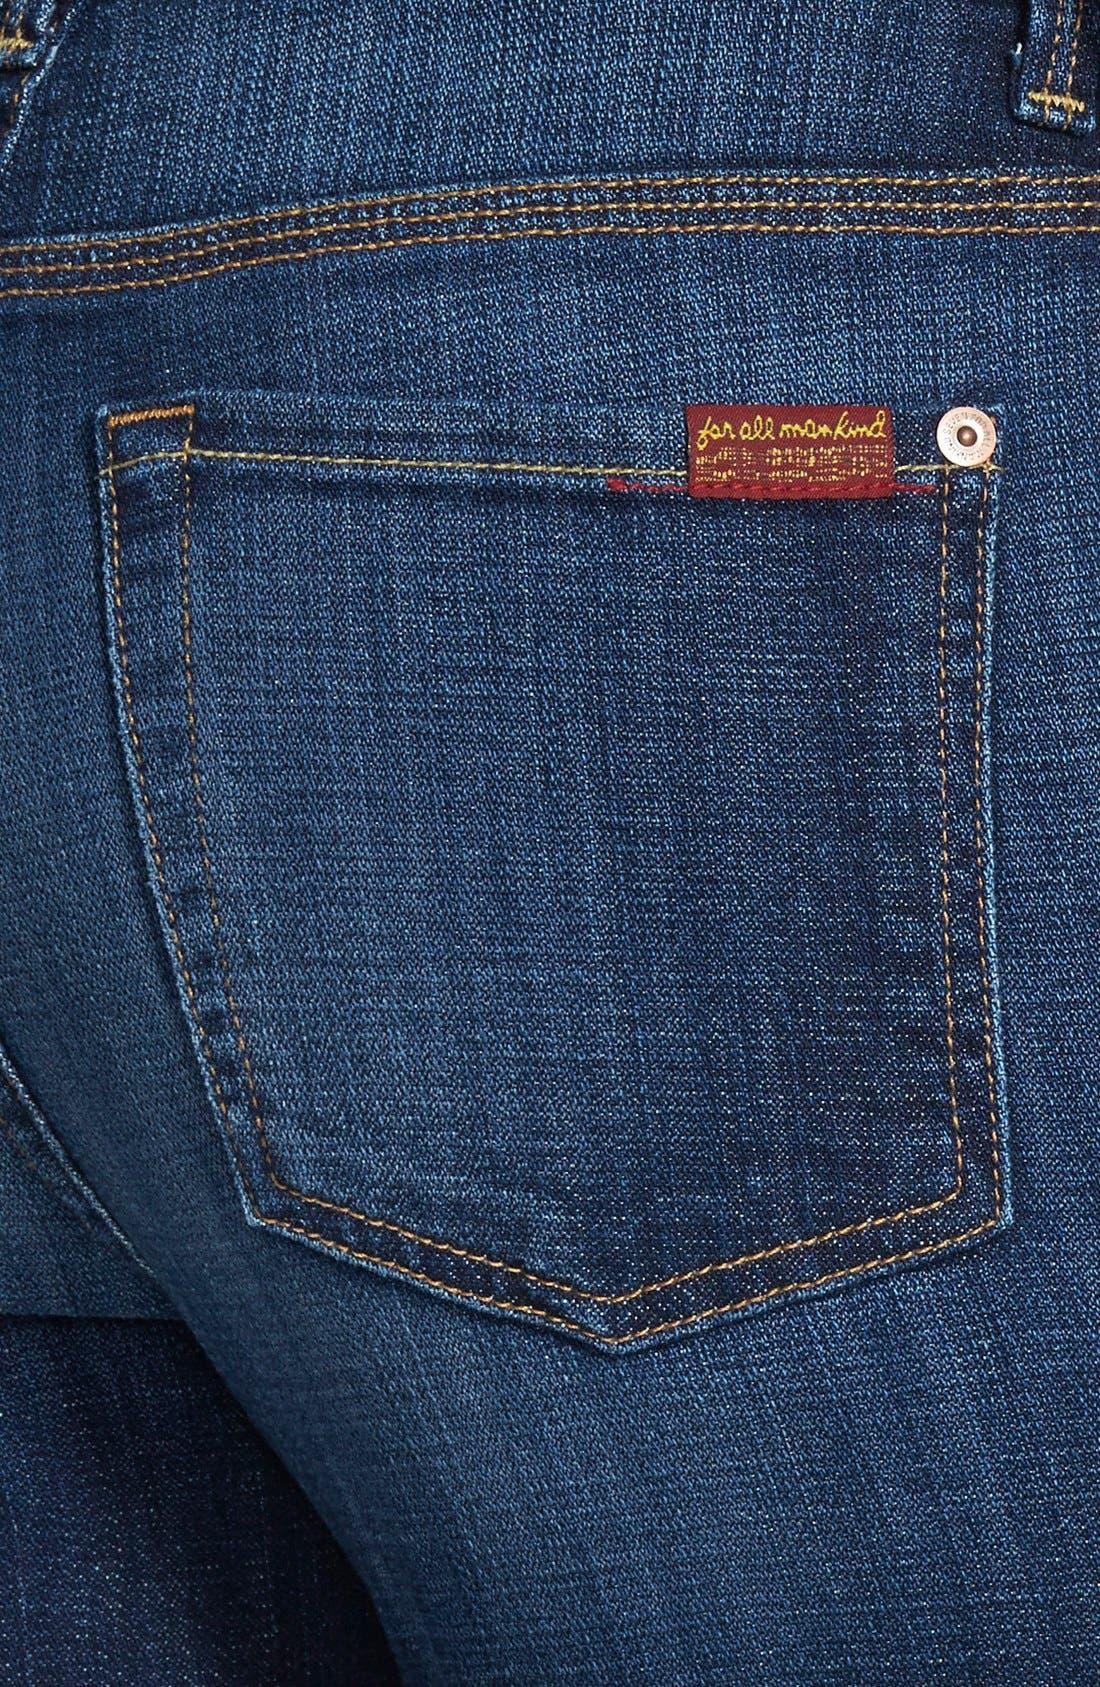 'Ginger' High Rise Flare Jeans,                             Alternate thumbnail 2, color,                             400